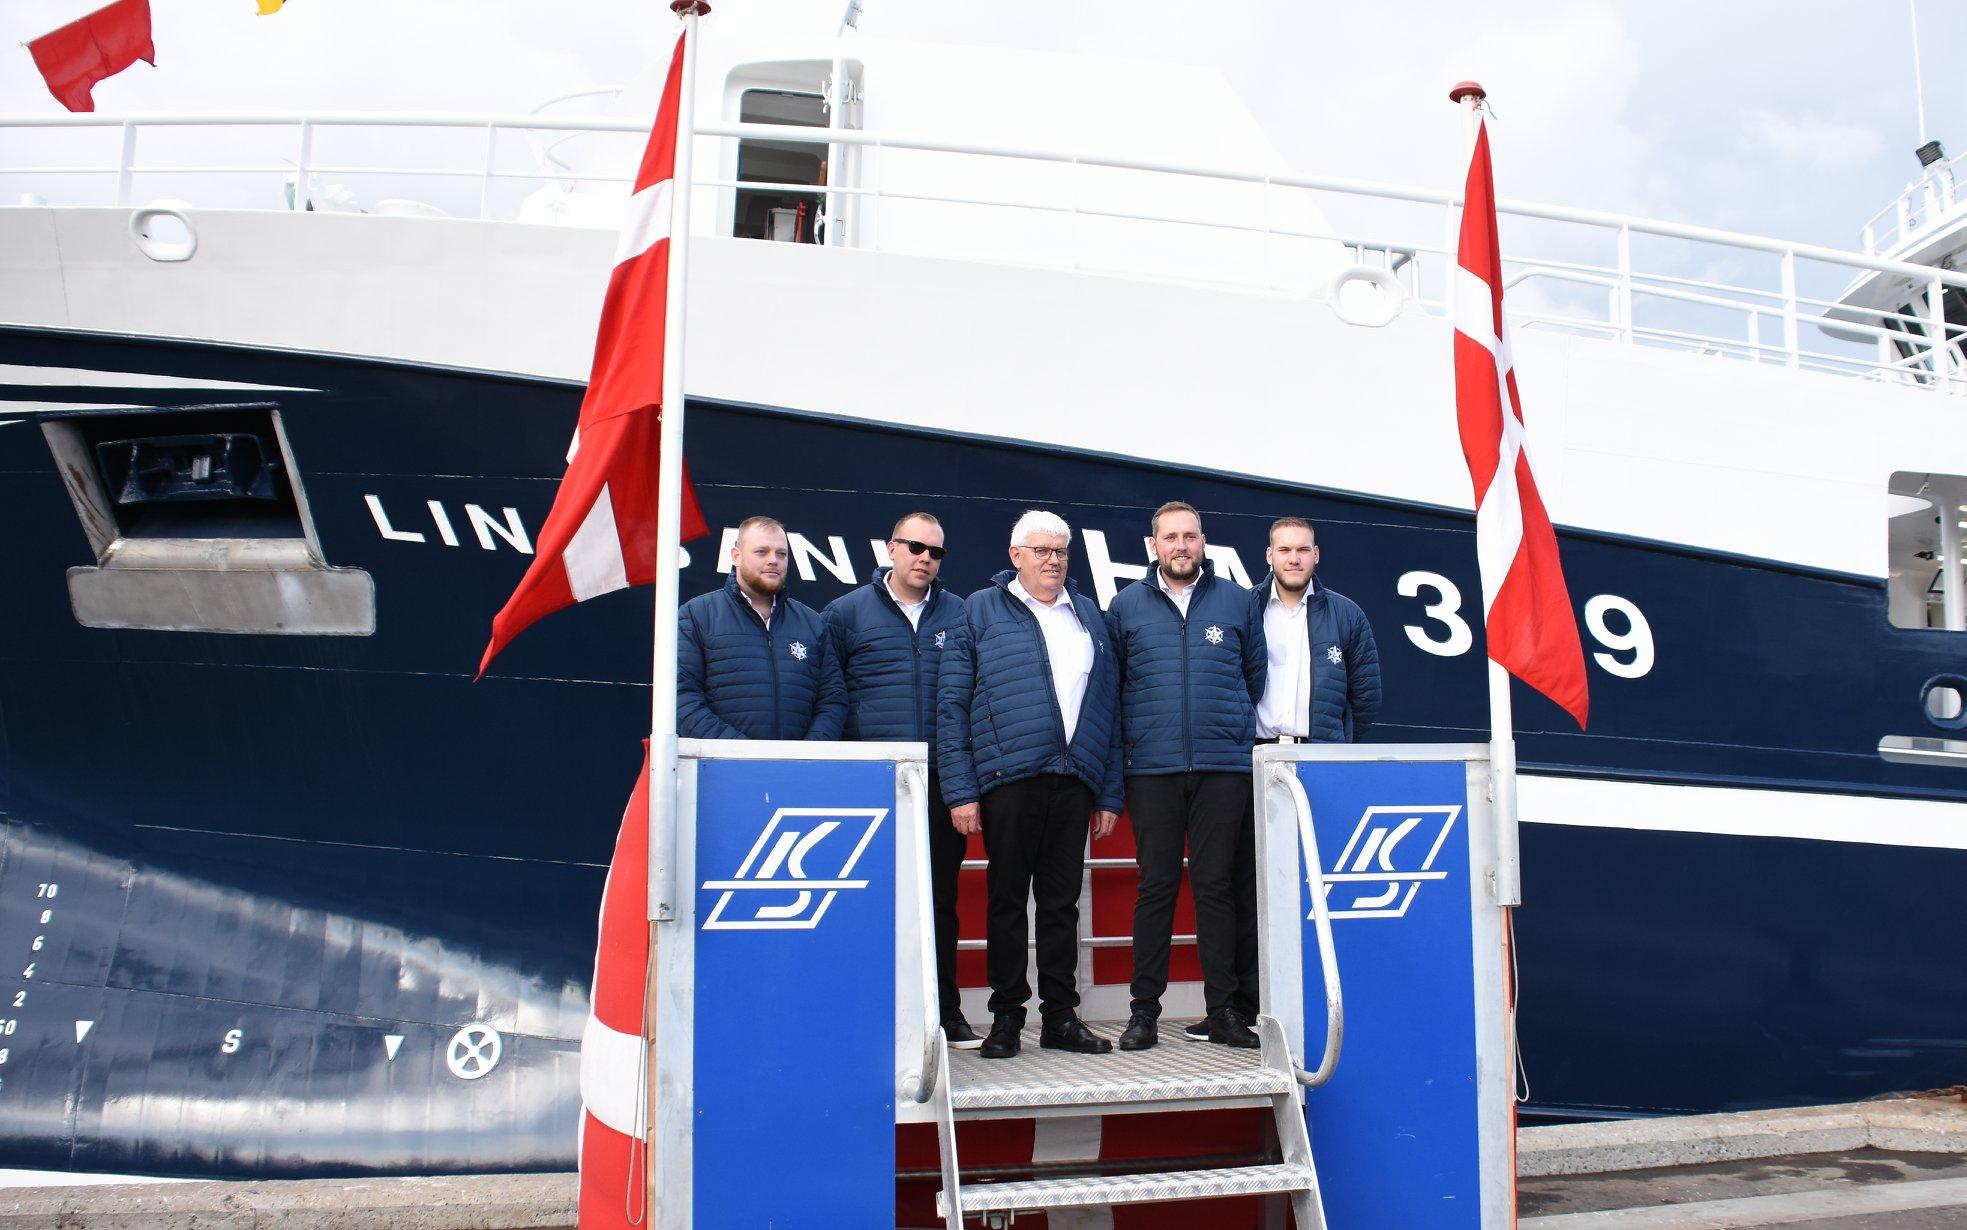 Familien Rasmussen fra venstre: Jeppe, Jonas, Benny, Jens og Johs. Foto: Karstensens Skibsværft A/S